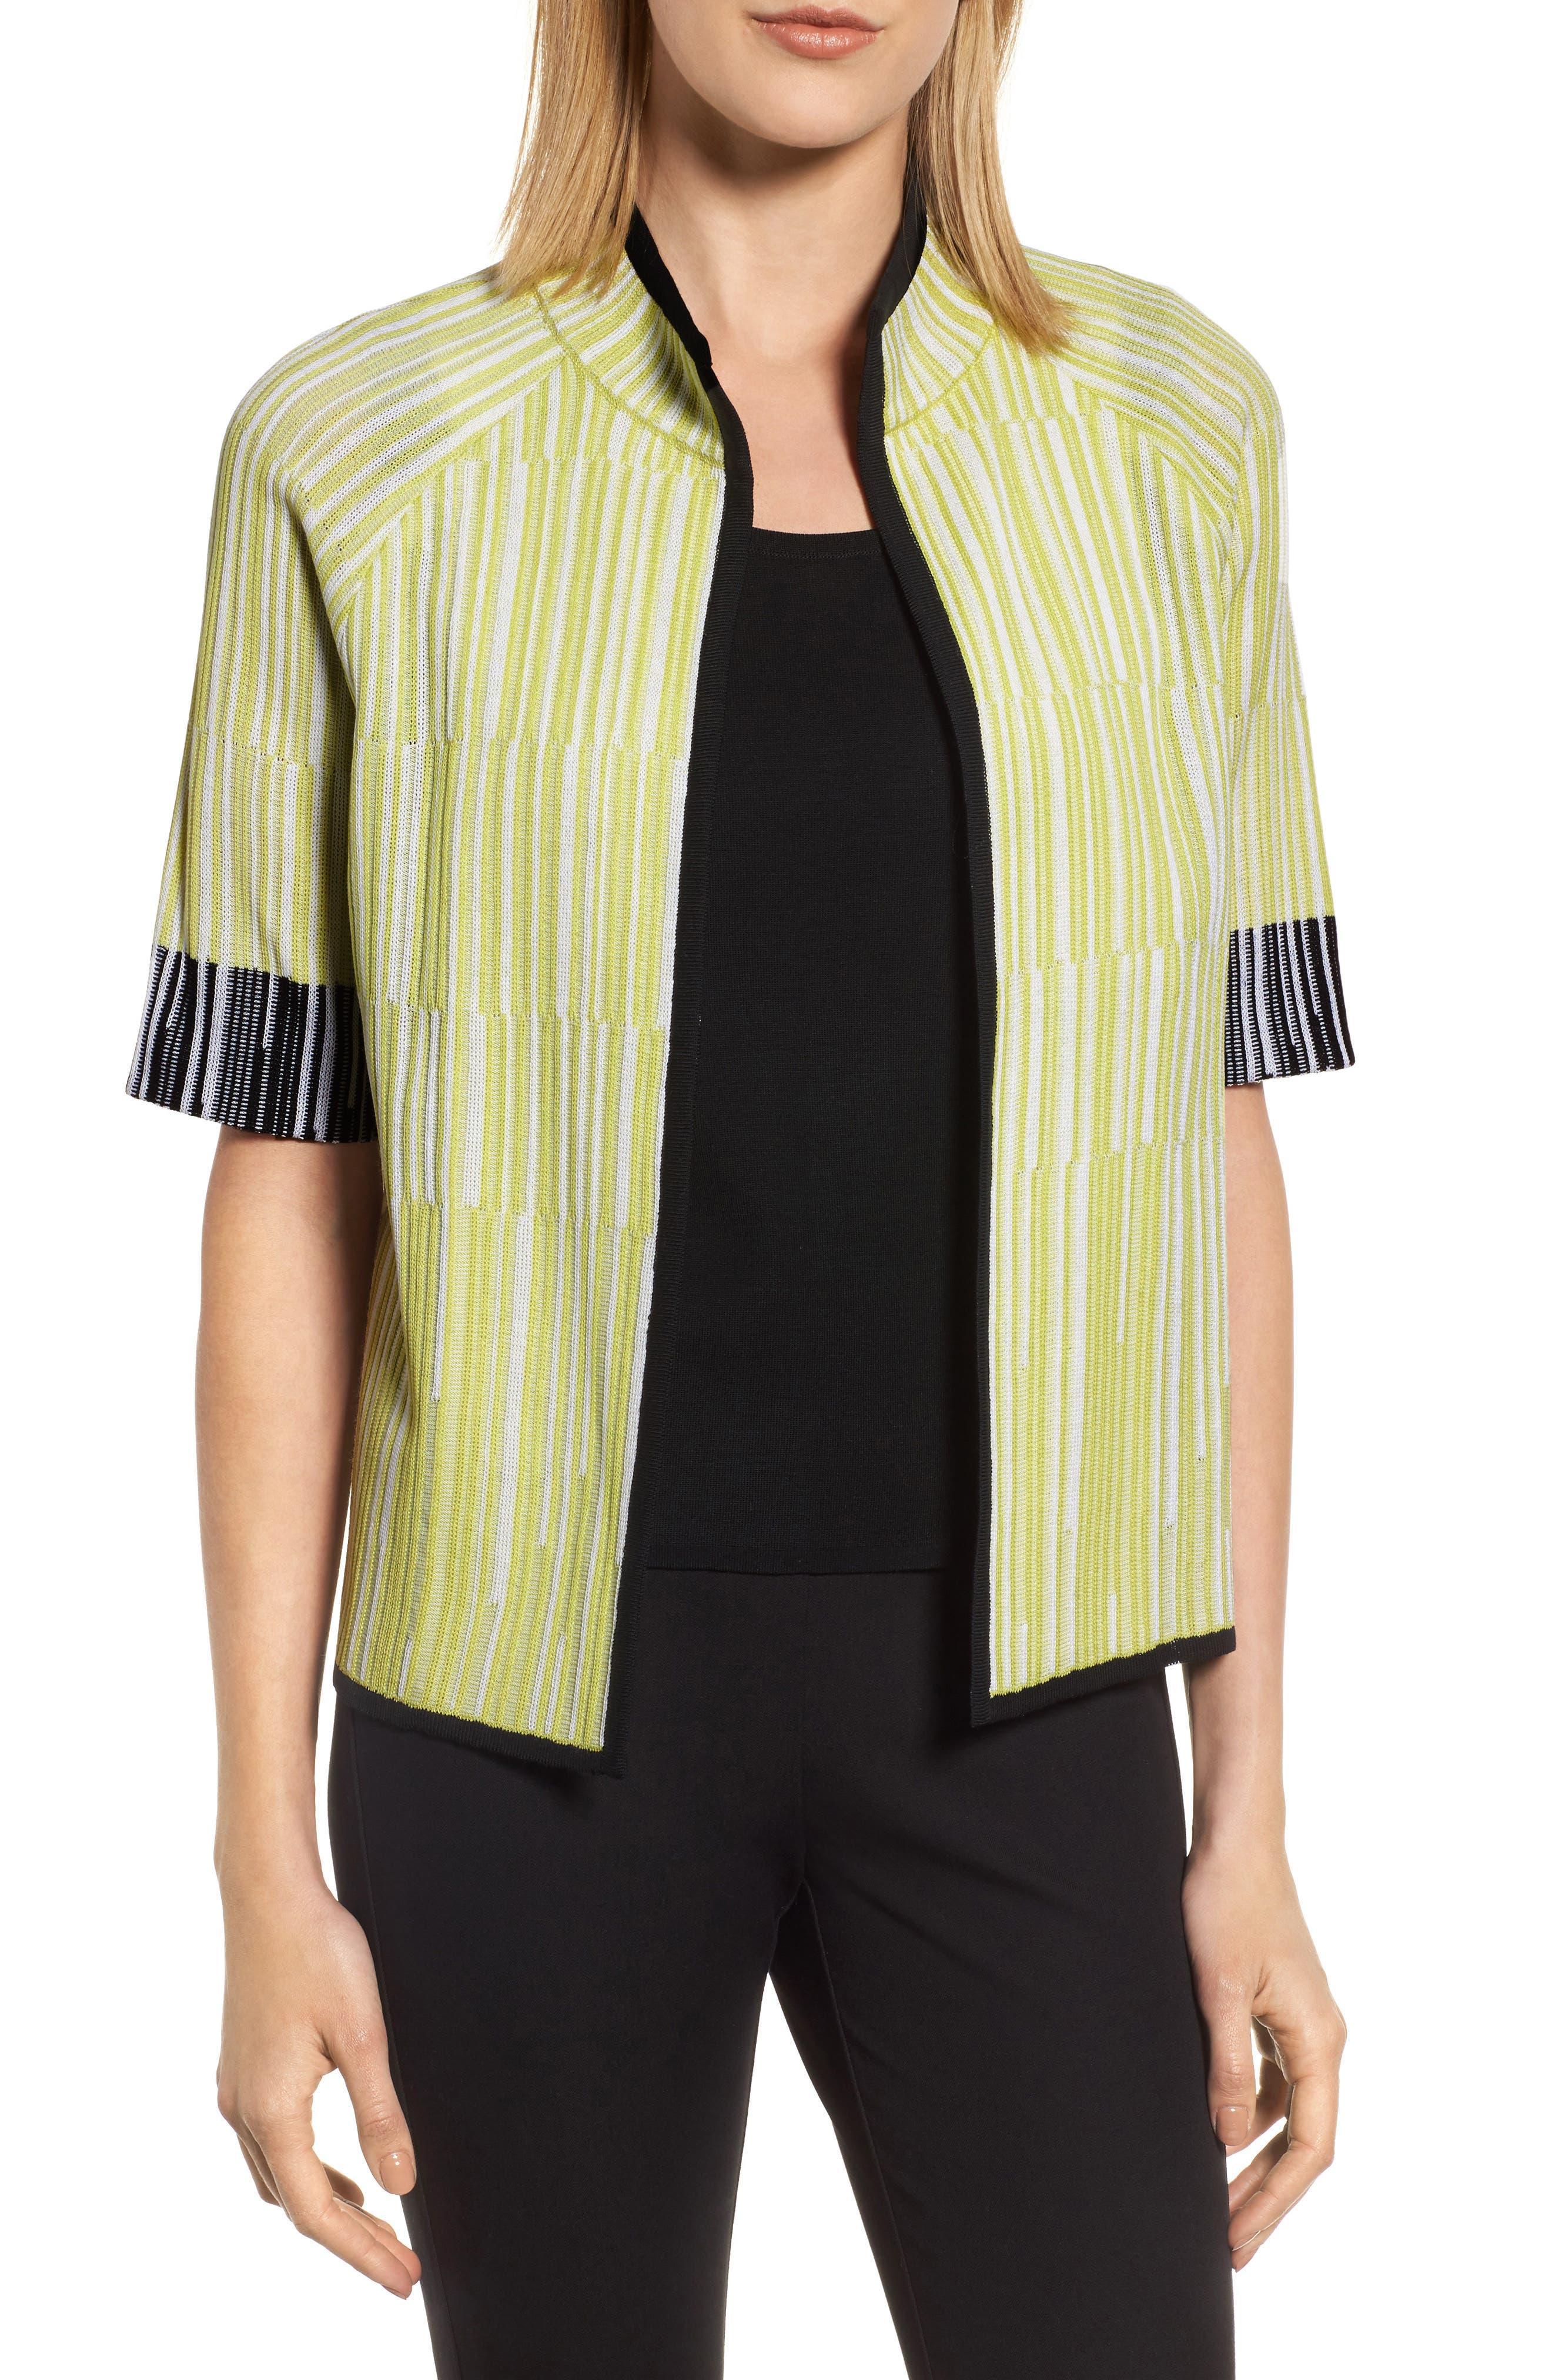 Alternate Image 1 Selected - Ming Wang Short Sleeve Jacquard Jacket